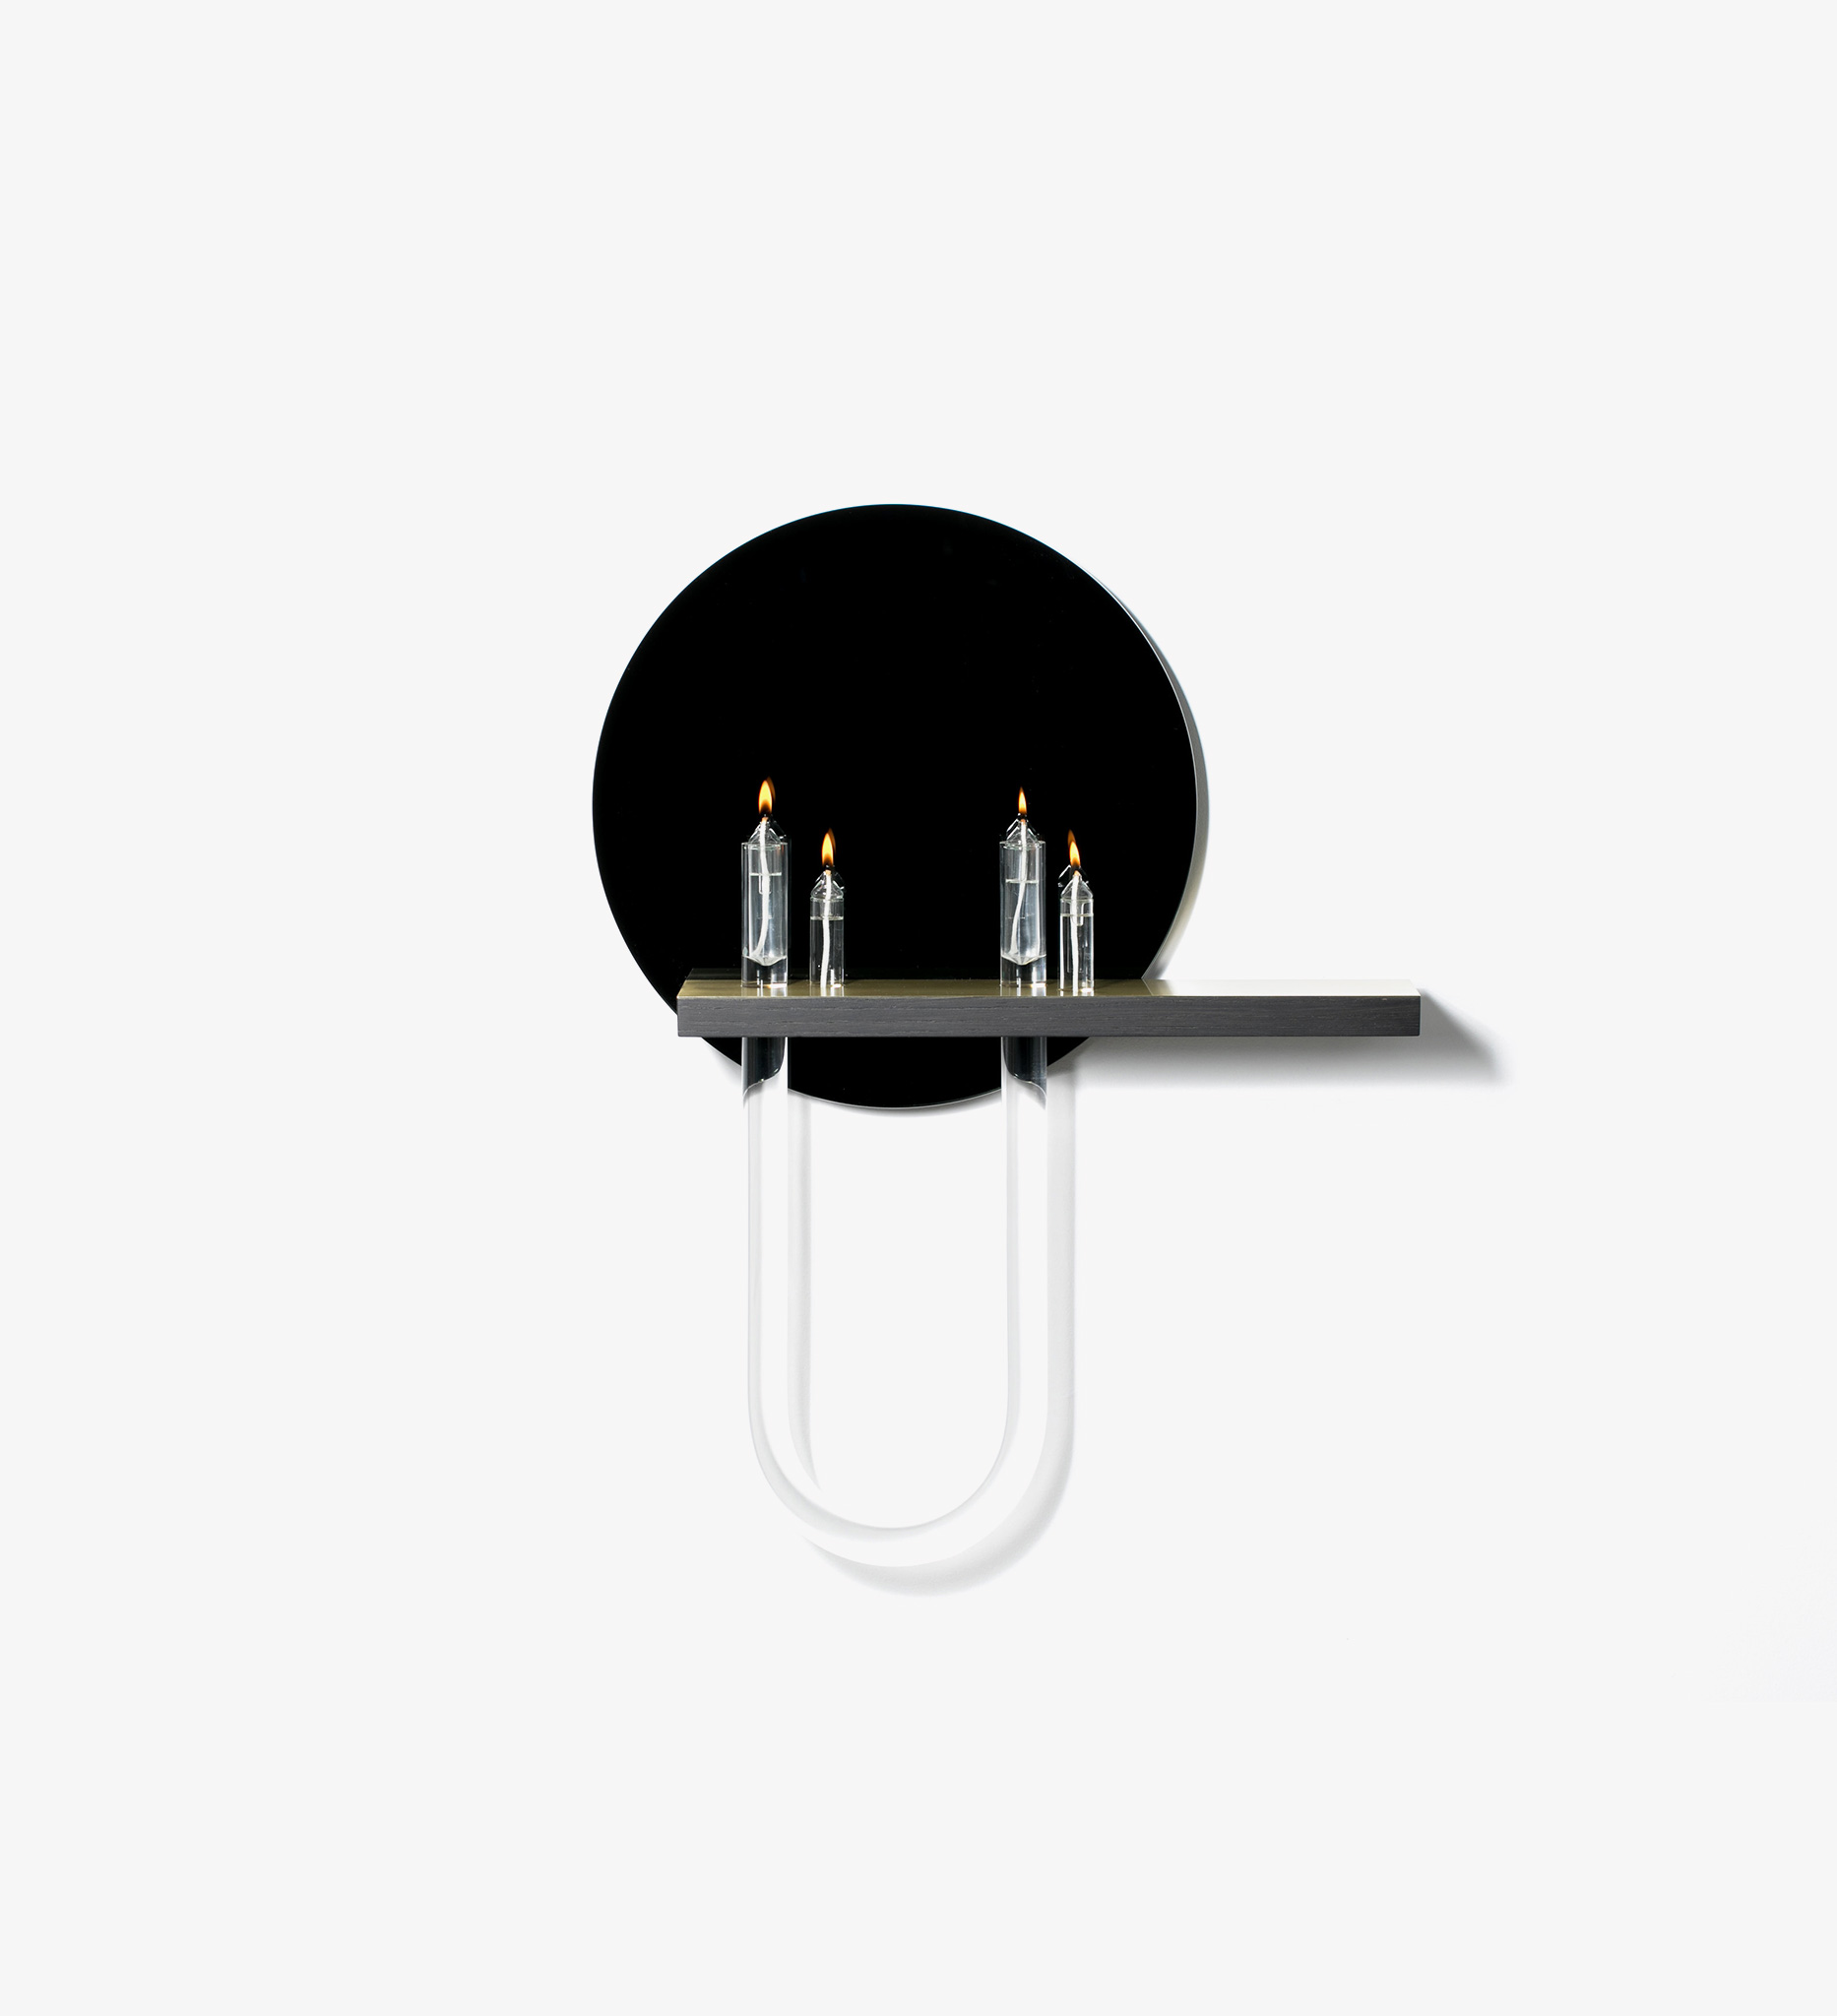 candelabra, accessory, lighting